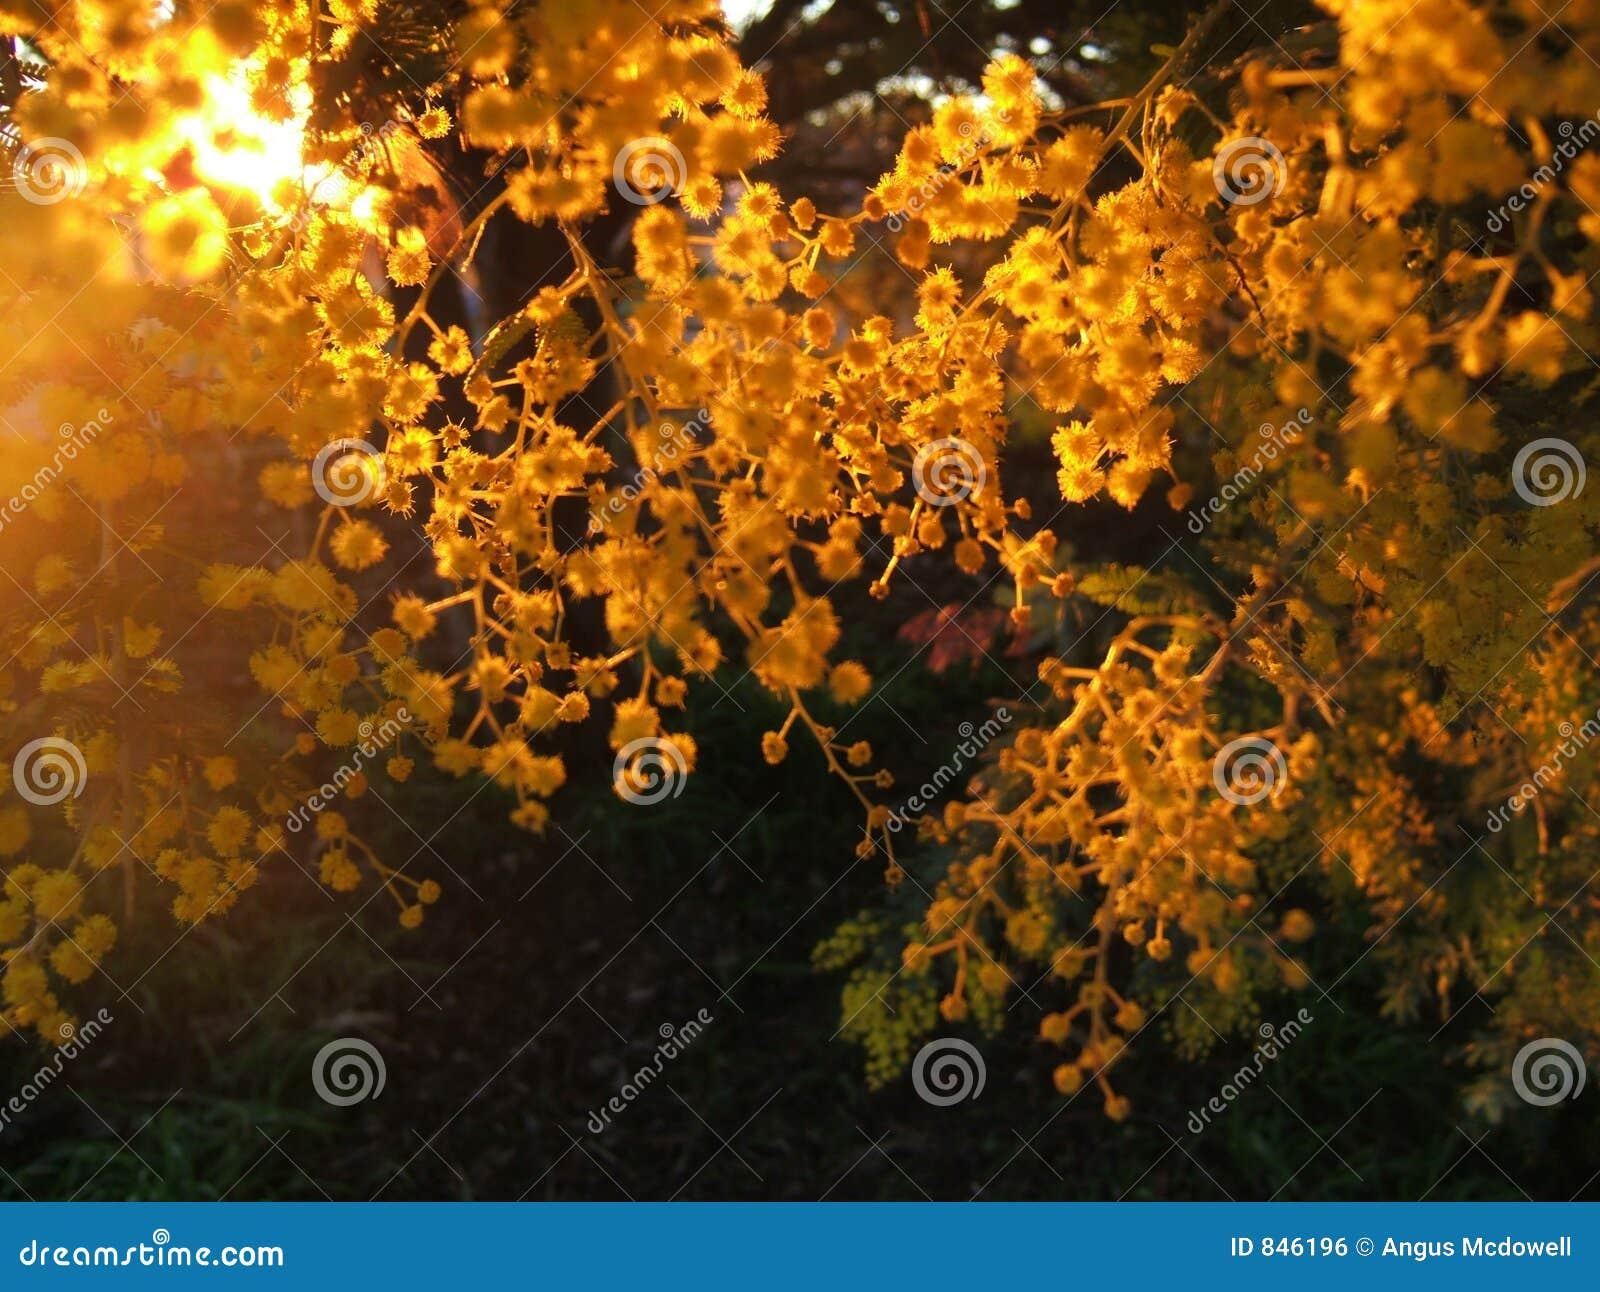 The golden Sun